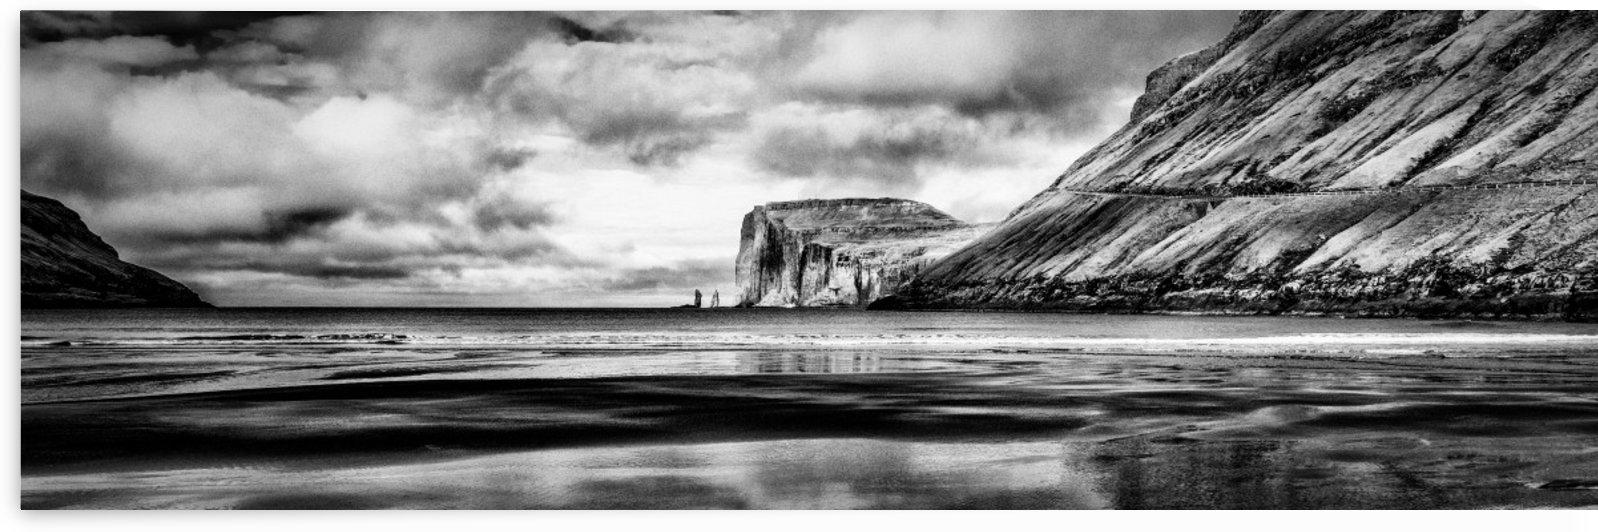 Tjörnuvík Faroe Islands by Pétur Reynisson